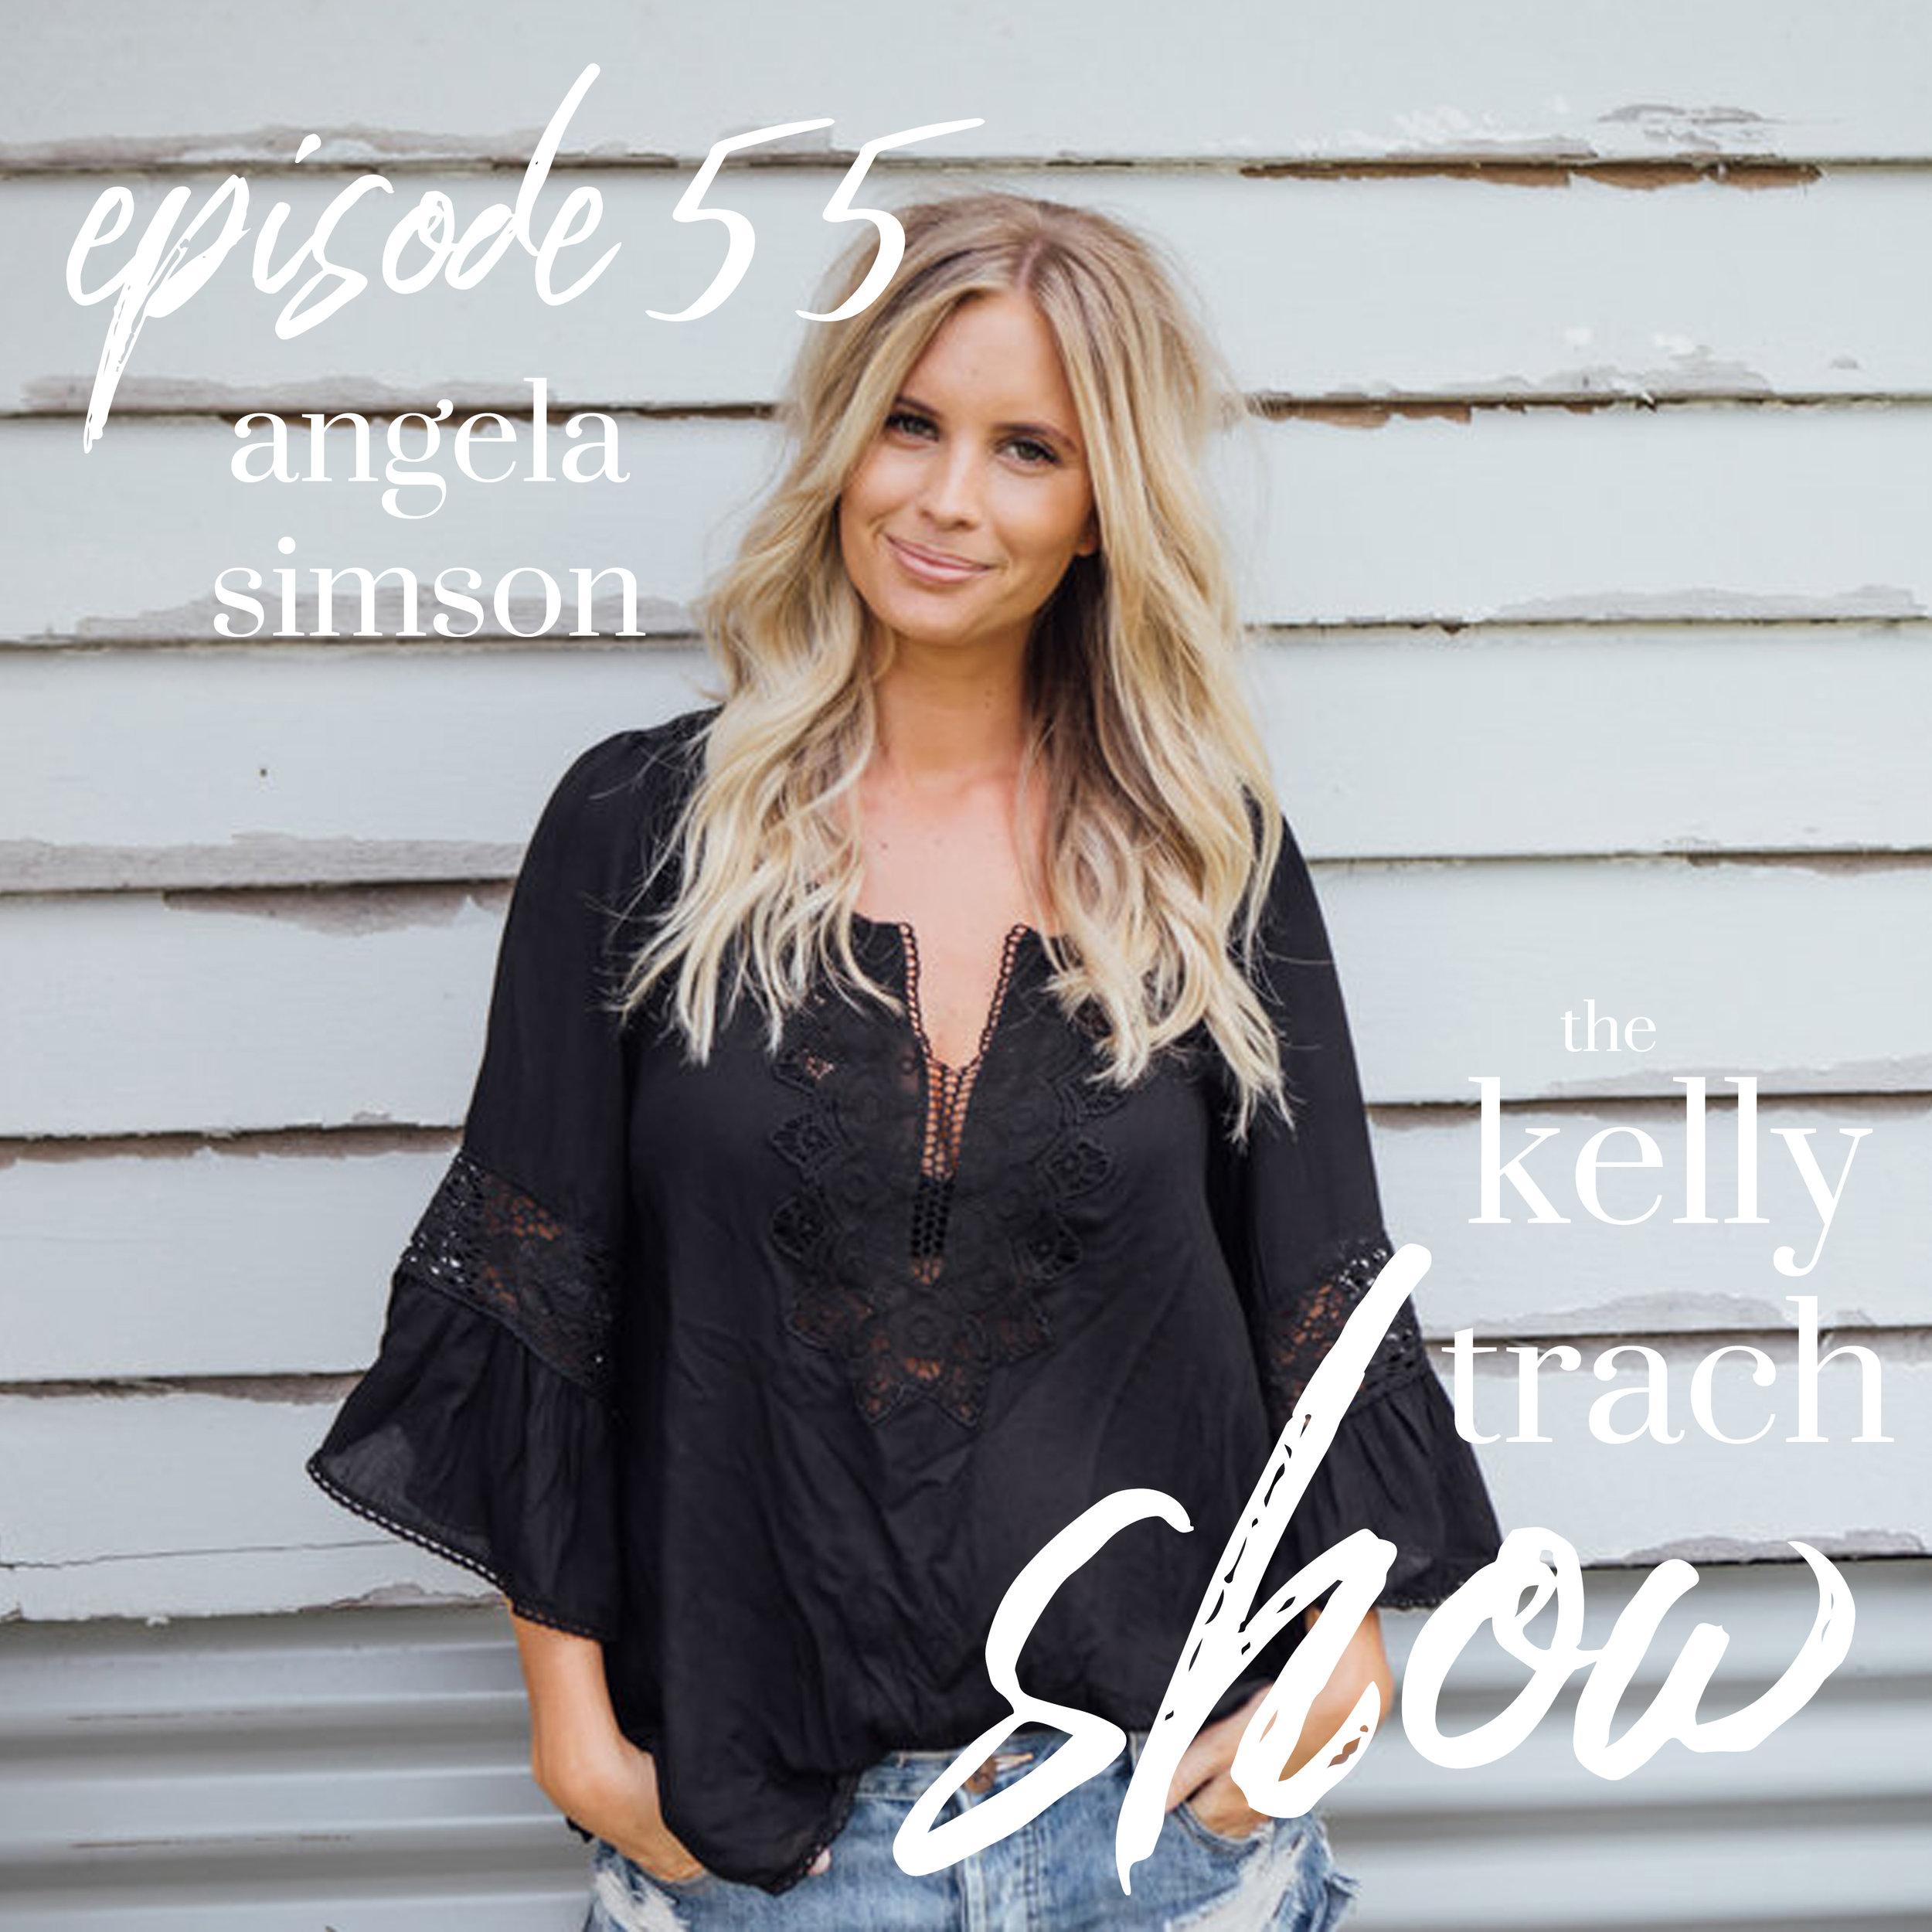 55 - Angela Simson - The Kelly Trach Show.jpg